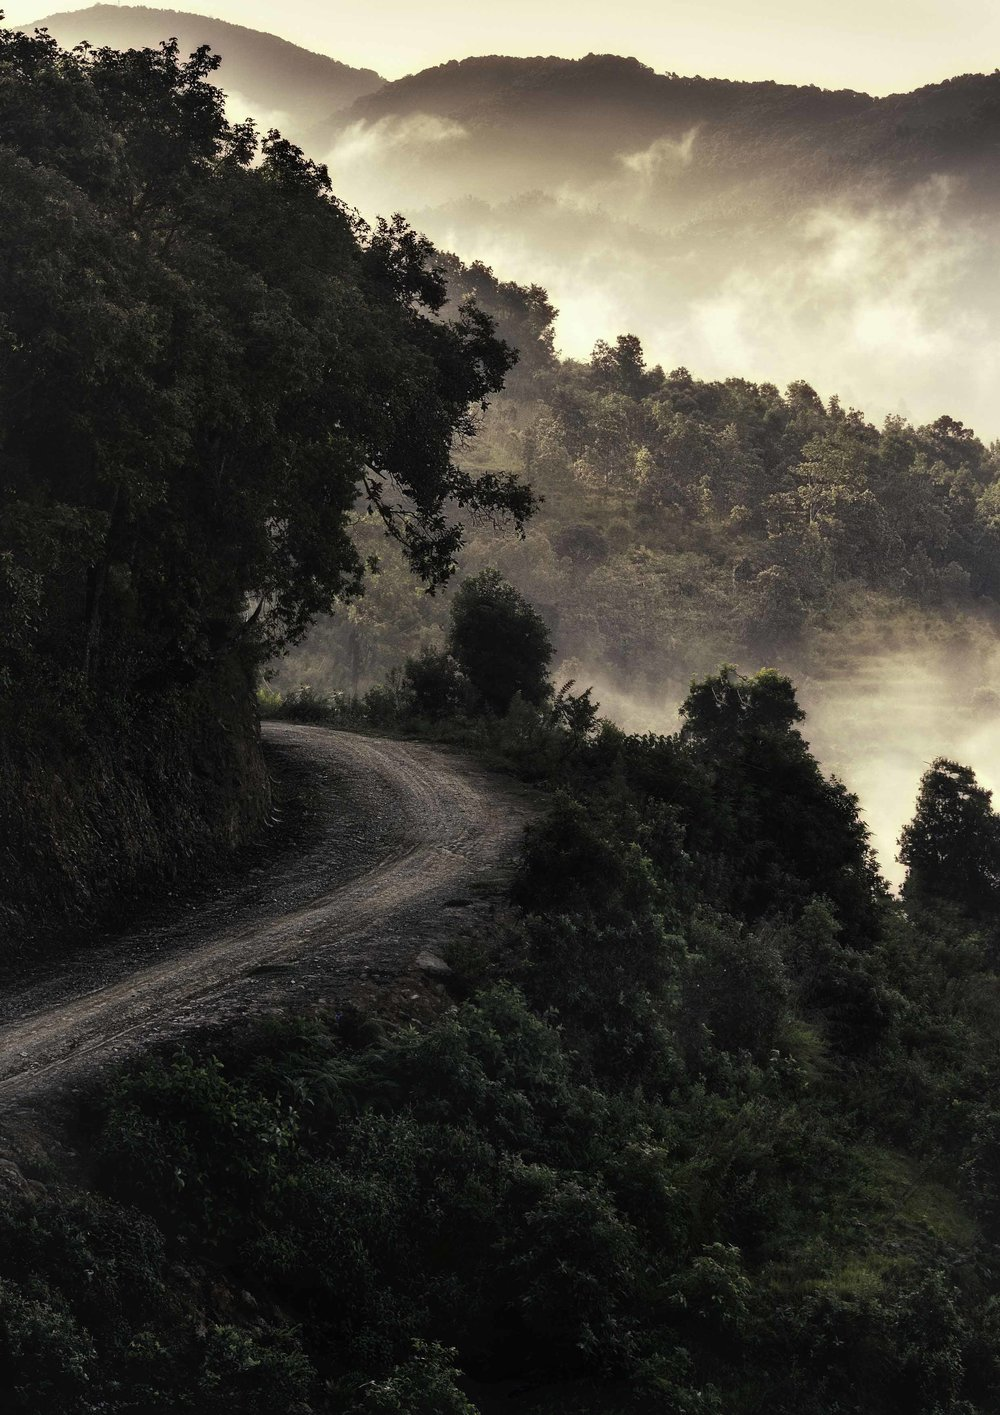 Road to Bandipur